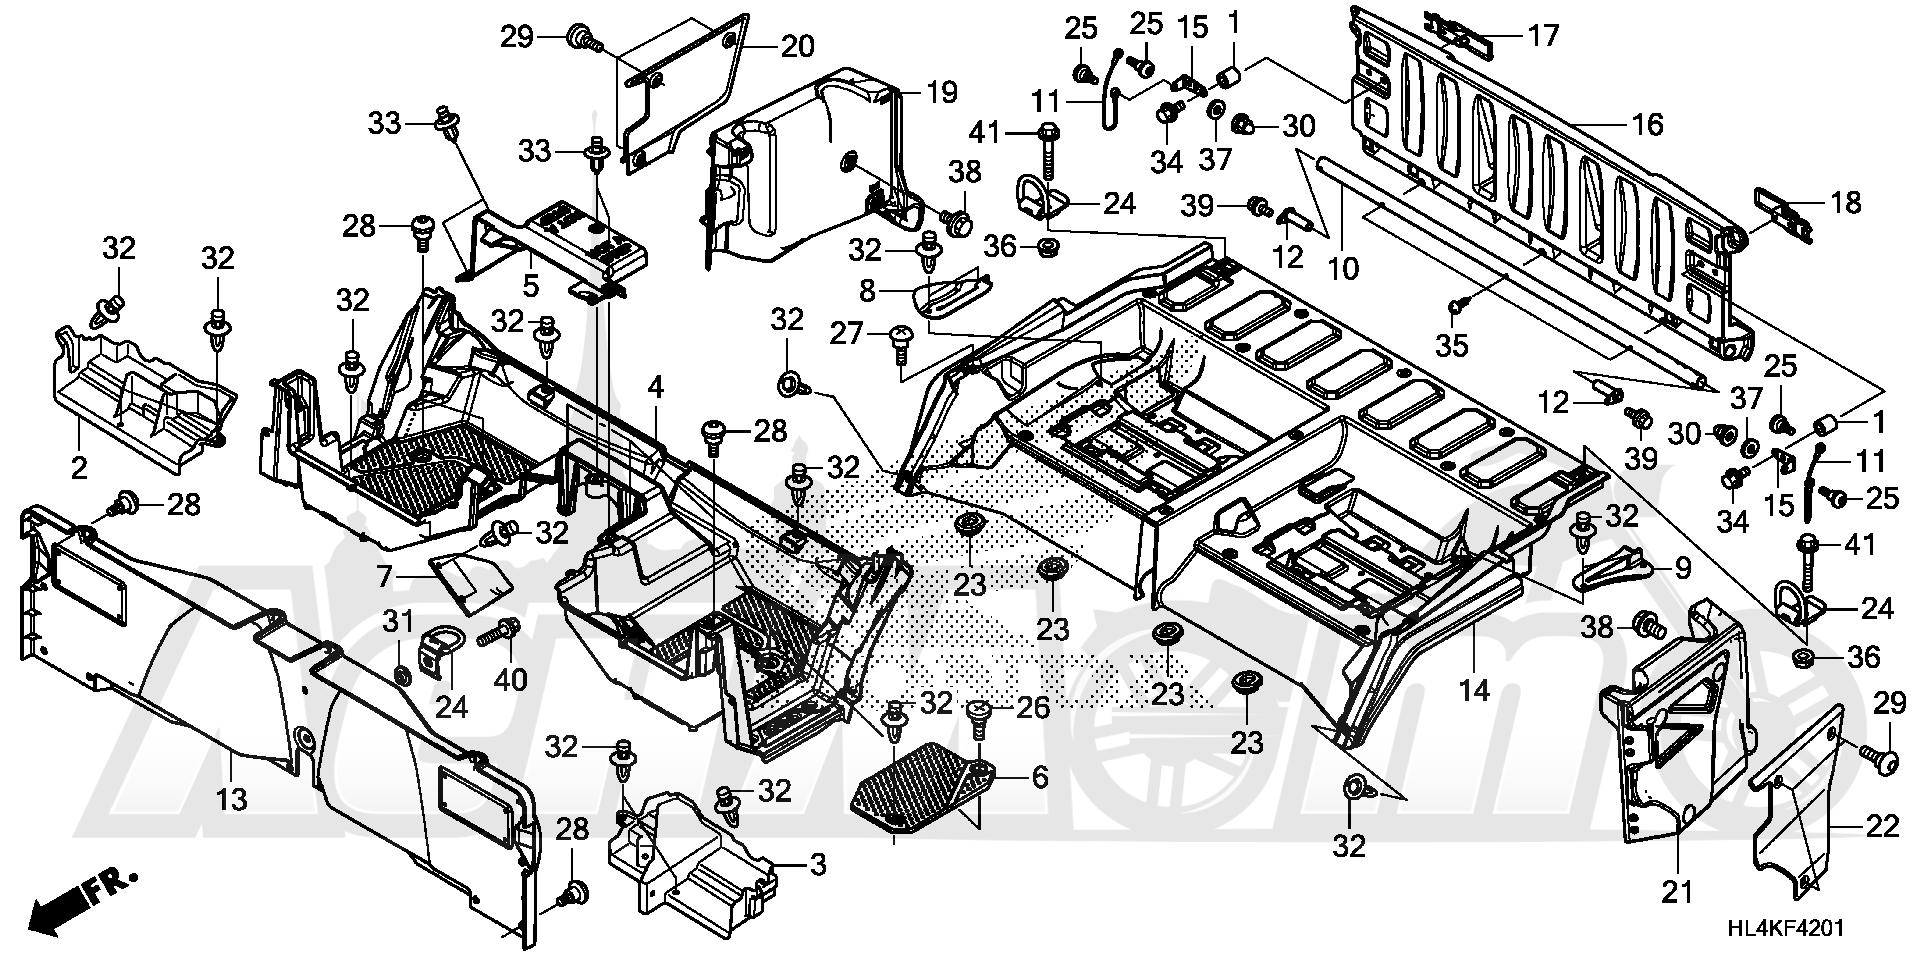 Запчасти для Квадроцикла Honda 2019 SXS1000M3P Раздел: BED PLATE AND REAR GATE (2) | BED пластина и зад GATE (2)